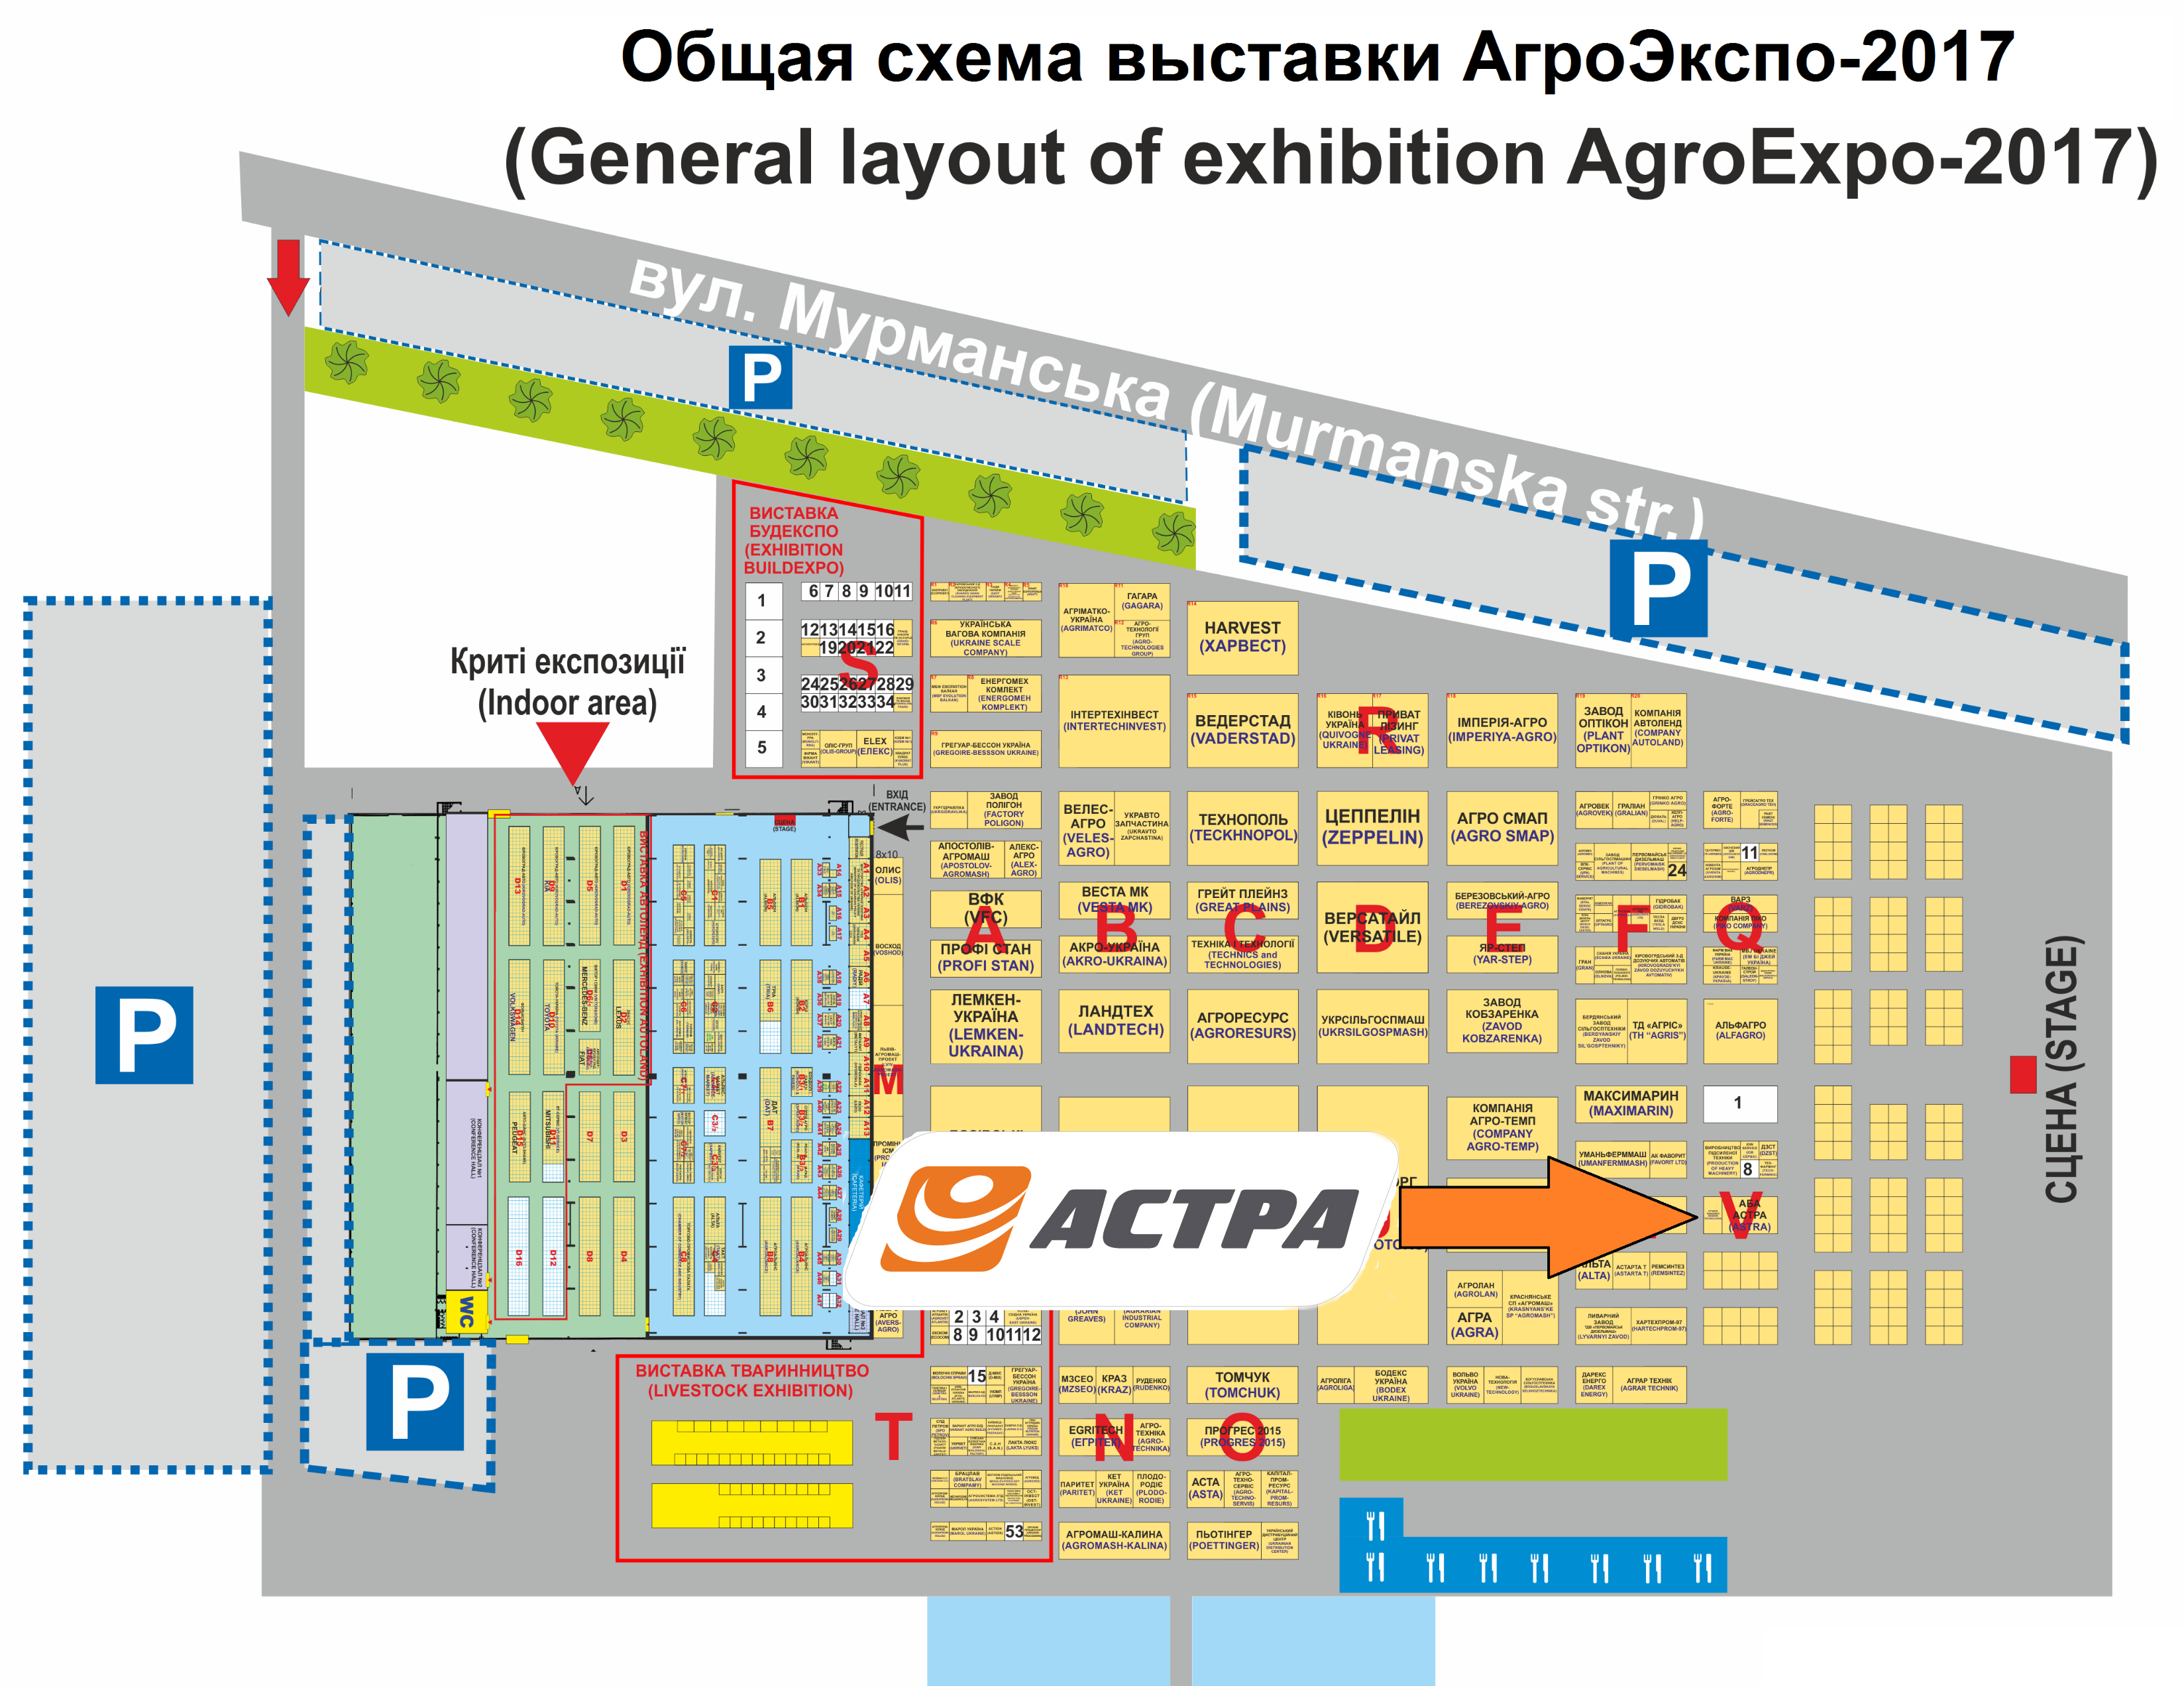 Схема размещения стенда АСА «Астра»